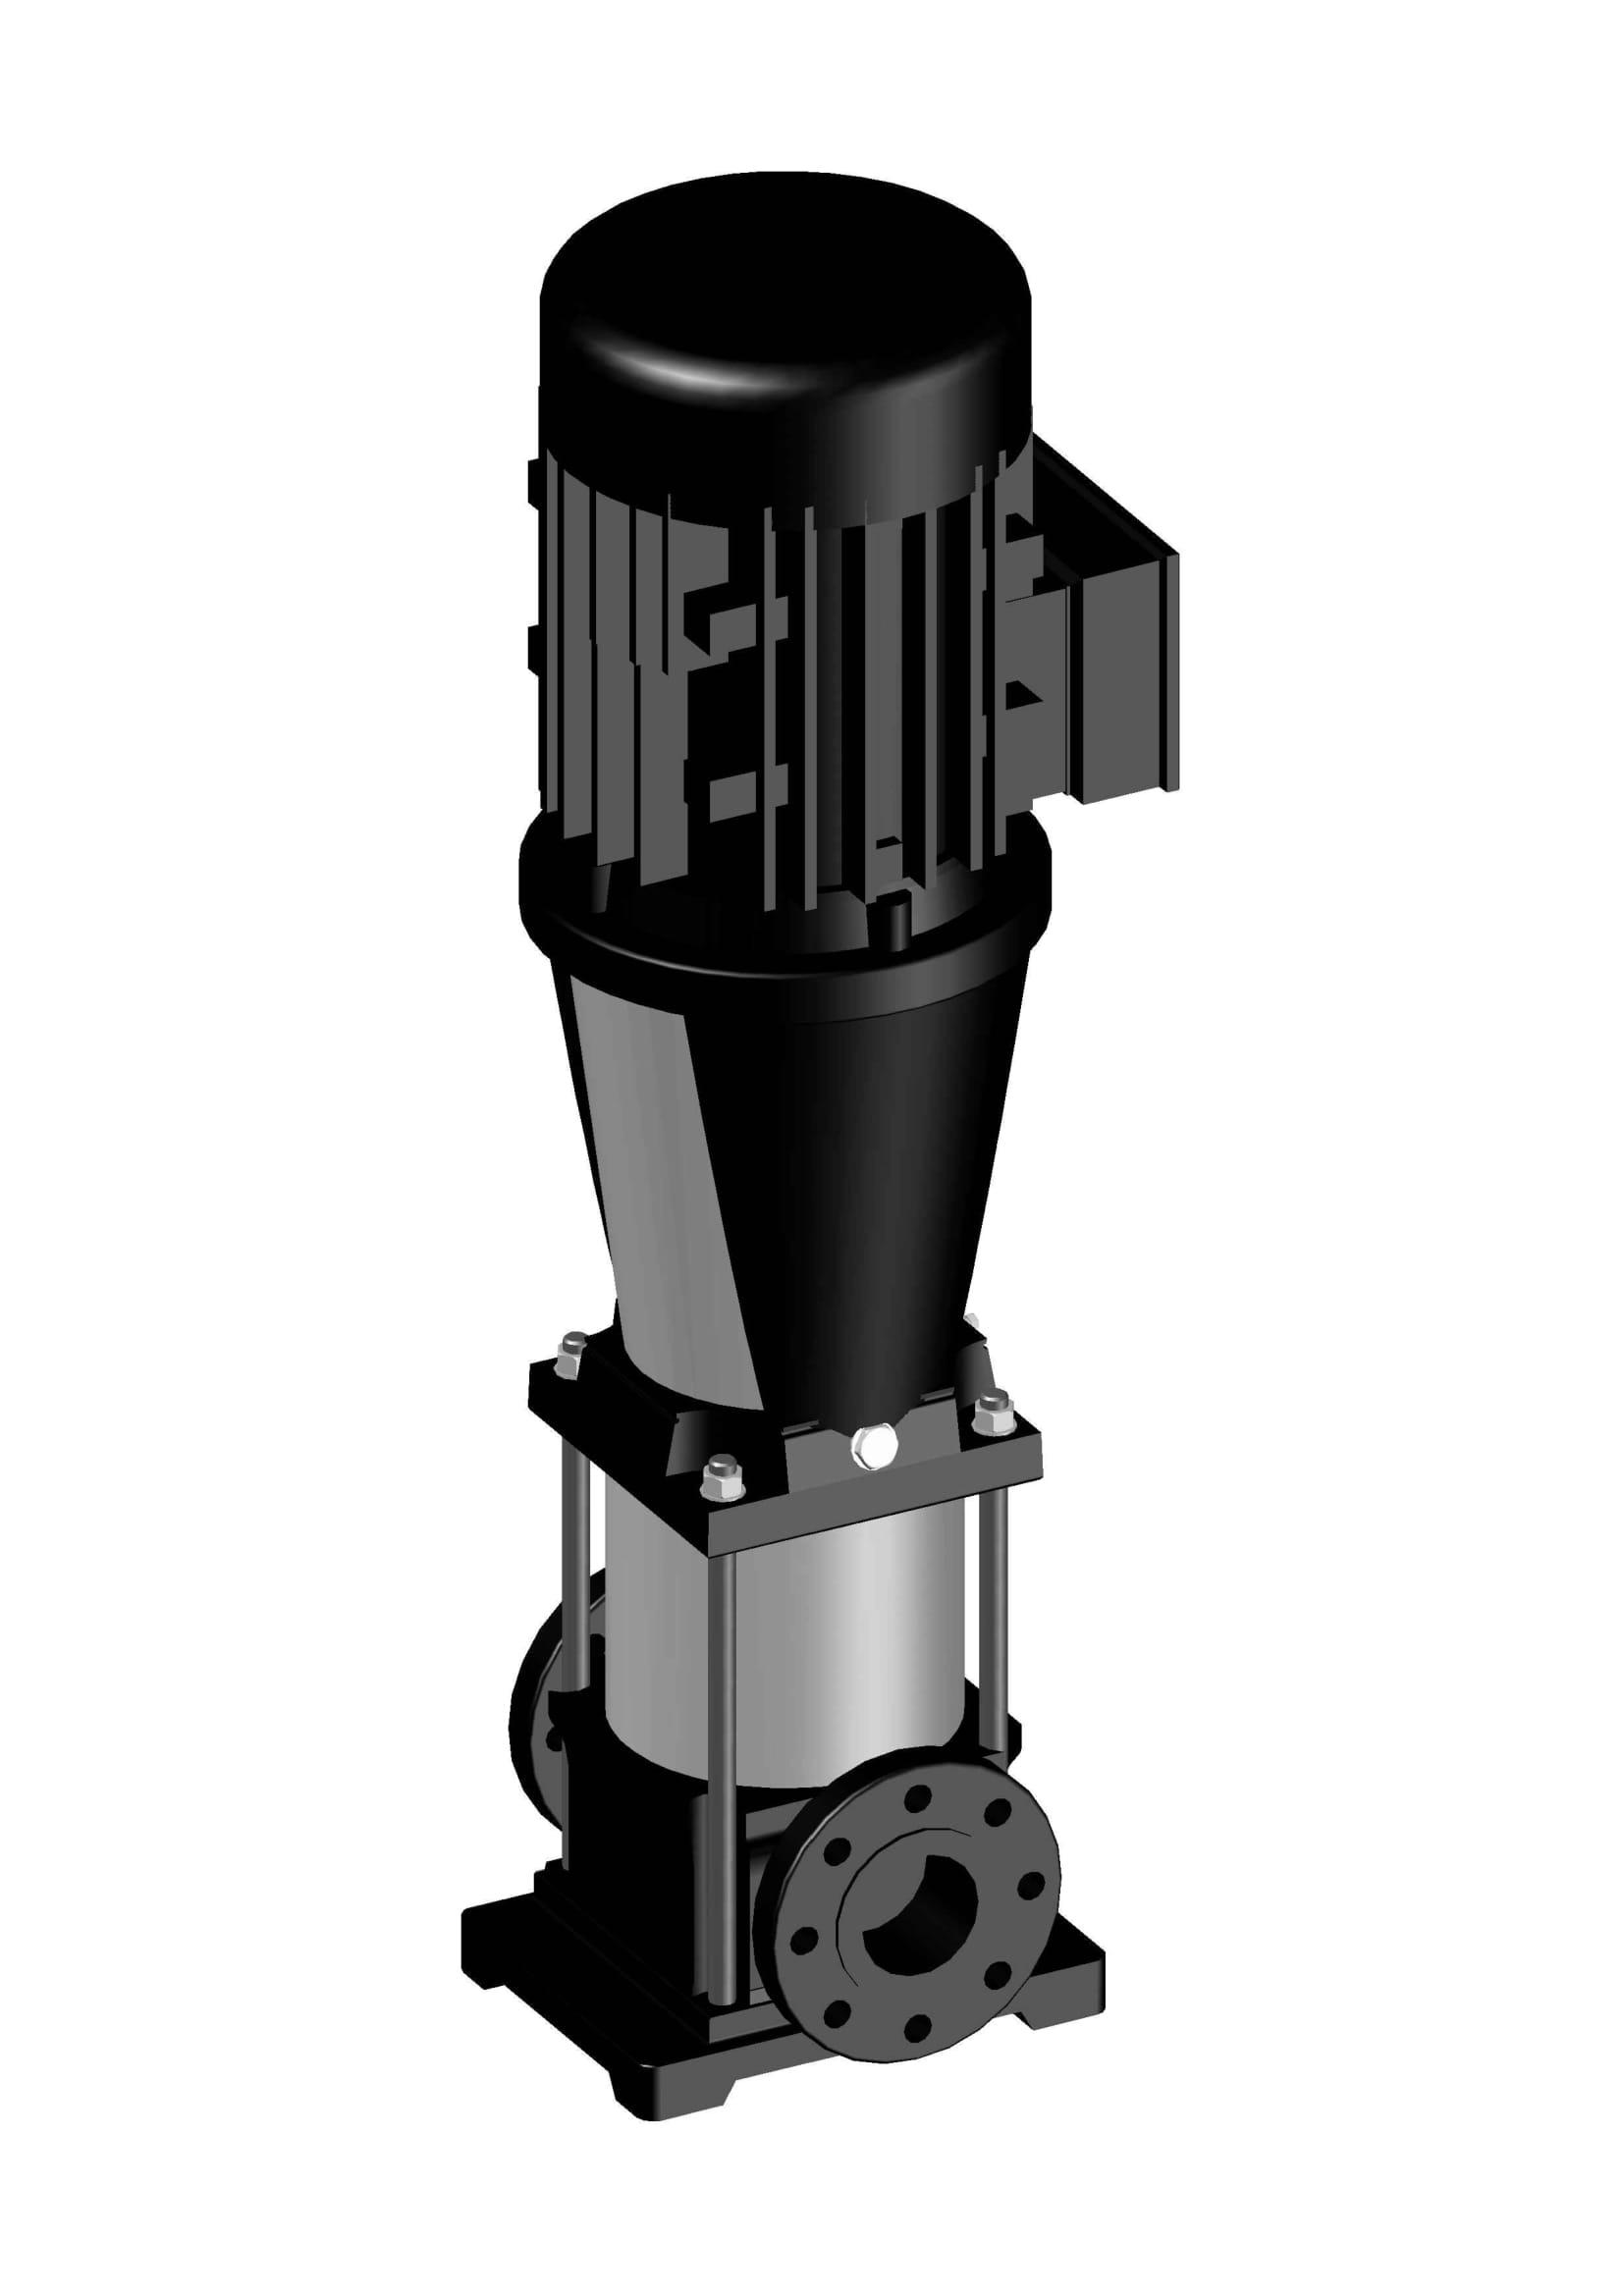 BV 32-04-02